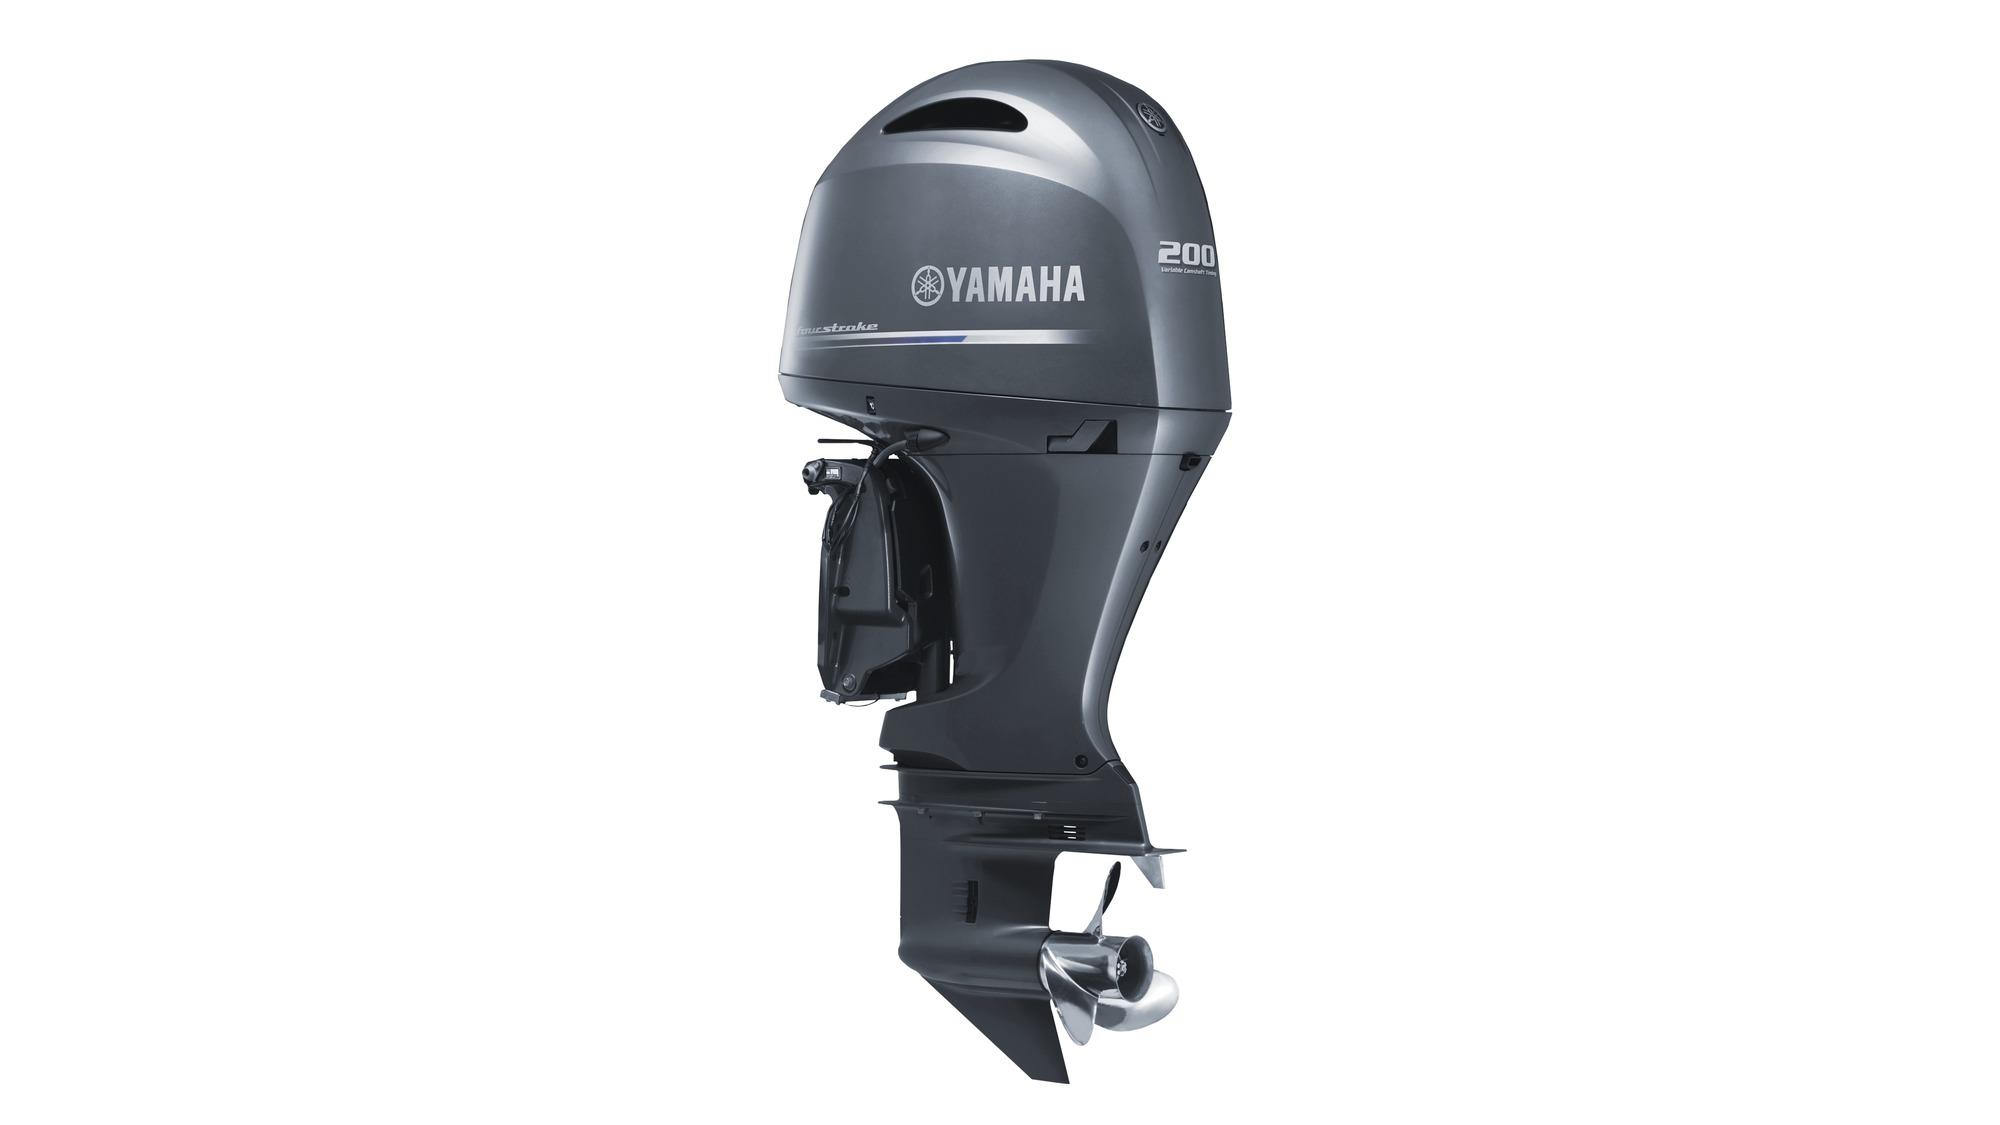 2015-Yamaha-F200G-EU-NA-Studio-002.jpg